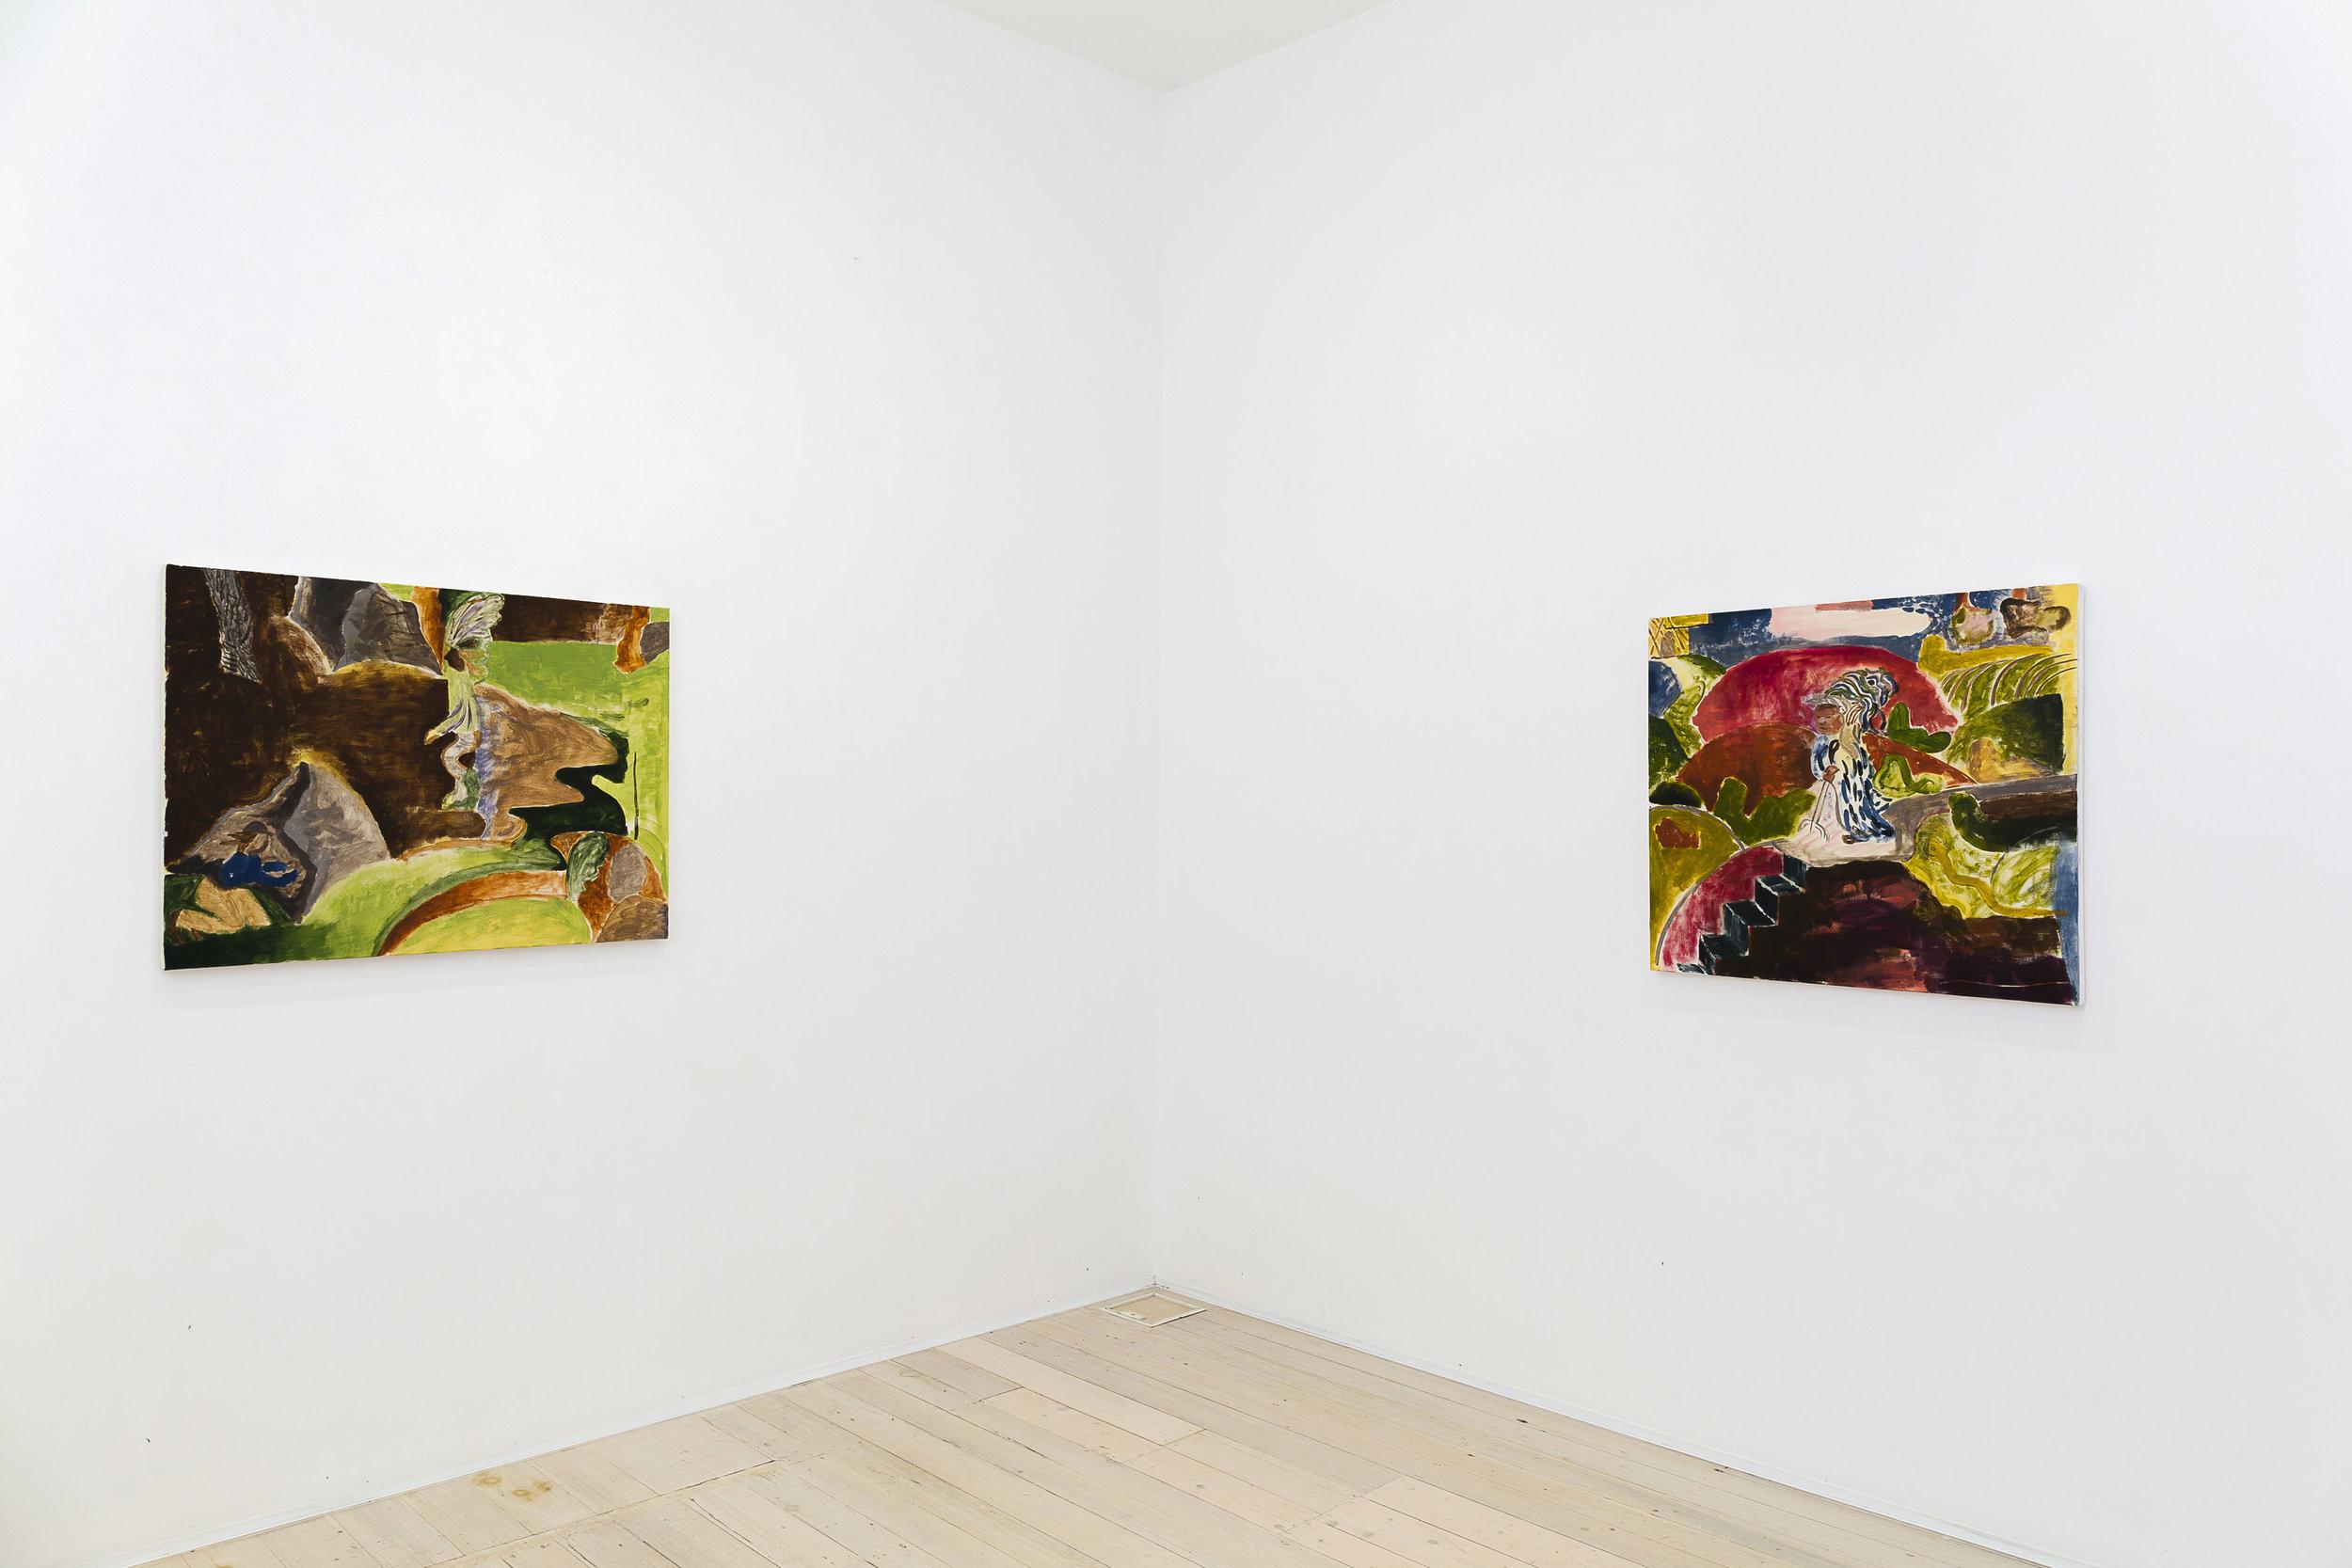 Tim Price, Gallery 9